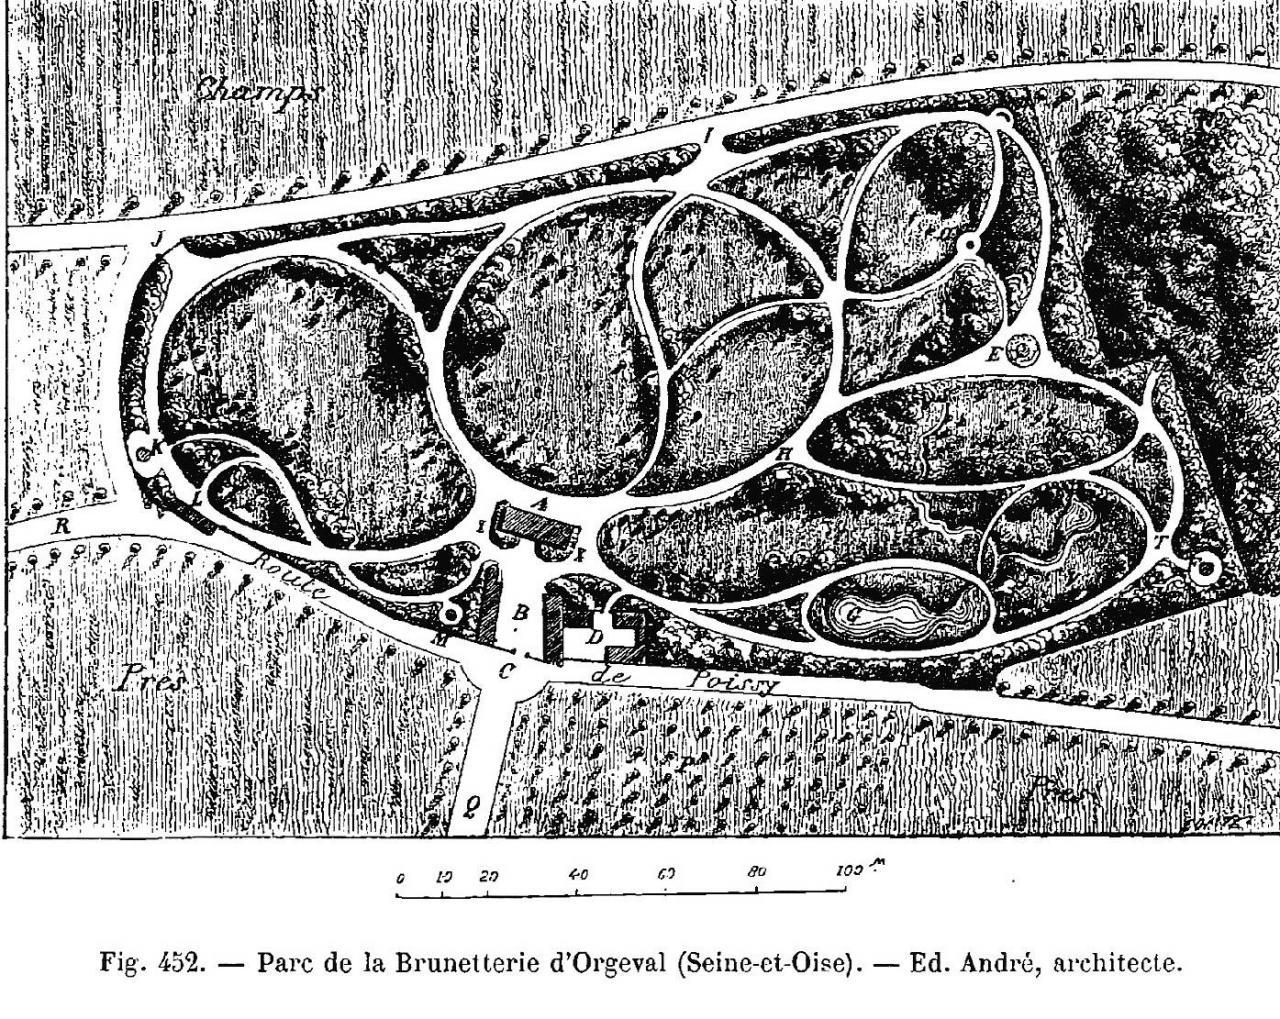 6 - La Brunetterie